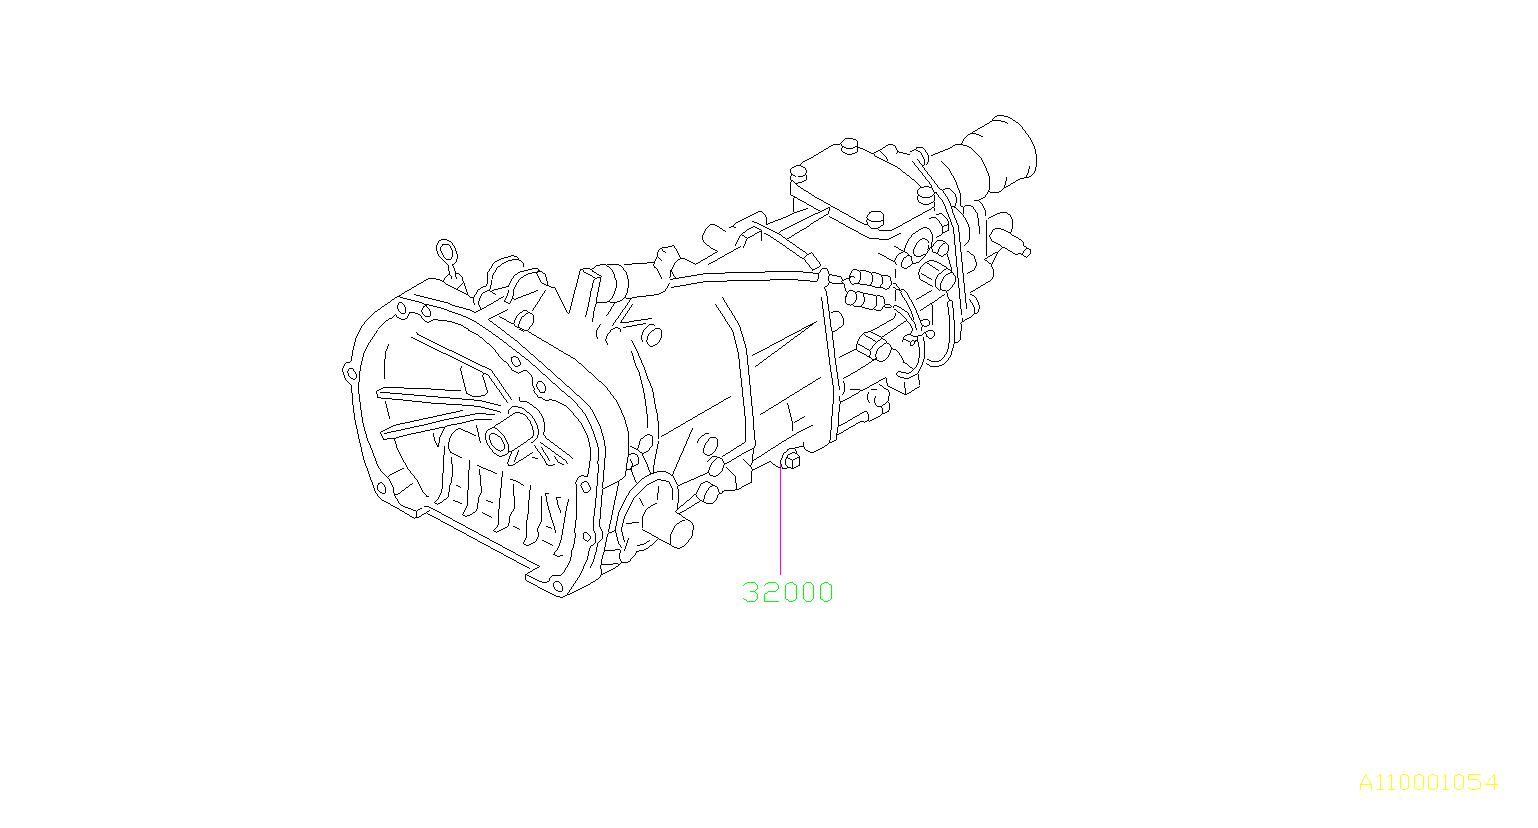 32000ah650 - Manual Transmission  Assembly